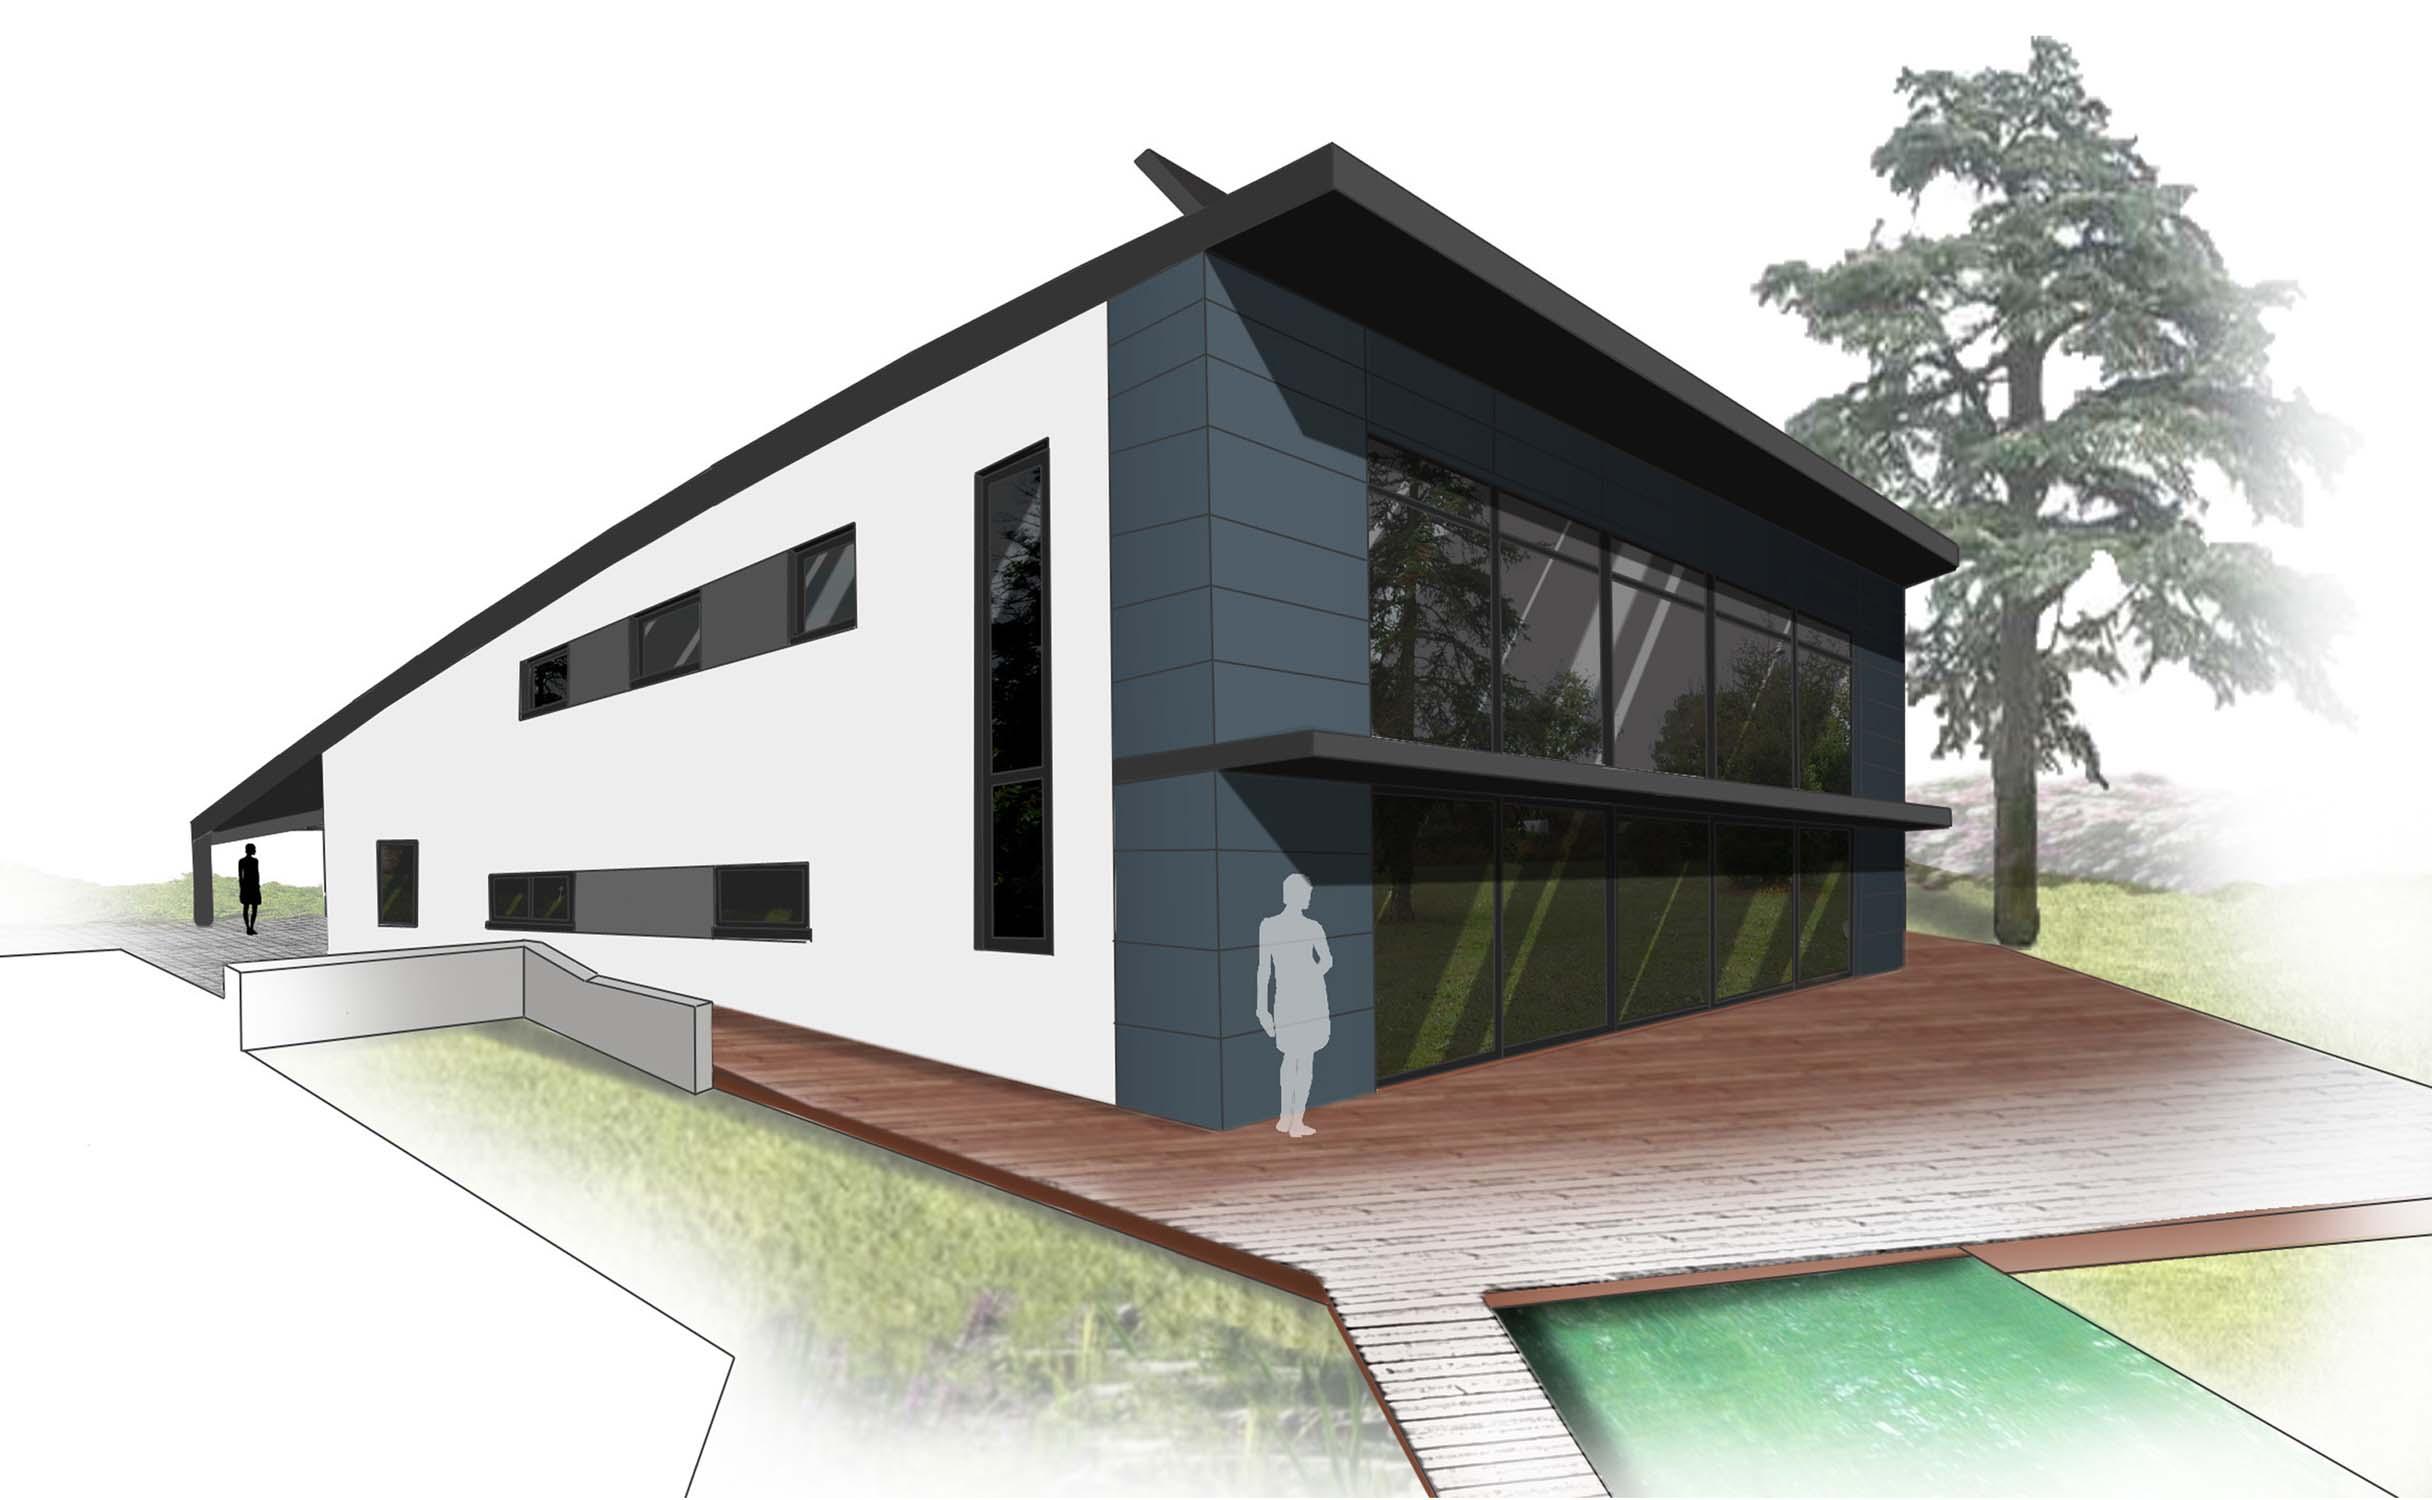 projet avec toit v g talis sud couedel design herve couedel architecte d 39 interieur. Black Bedroom Furniture Sets. Home Design Ideas